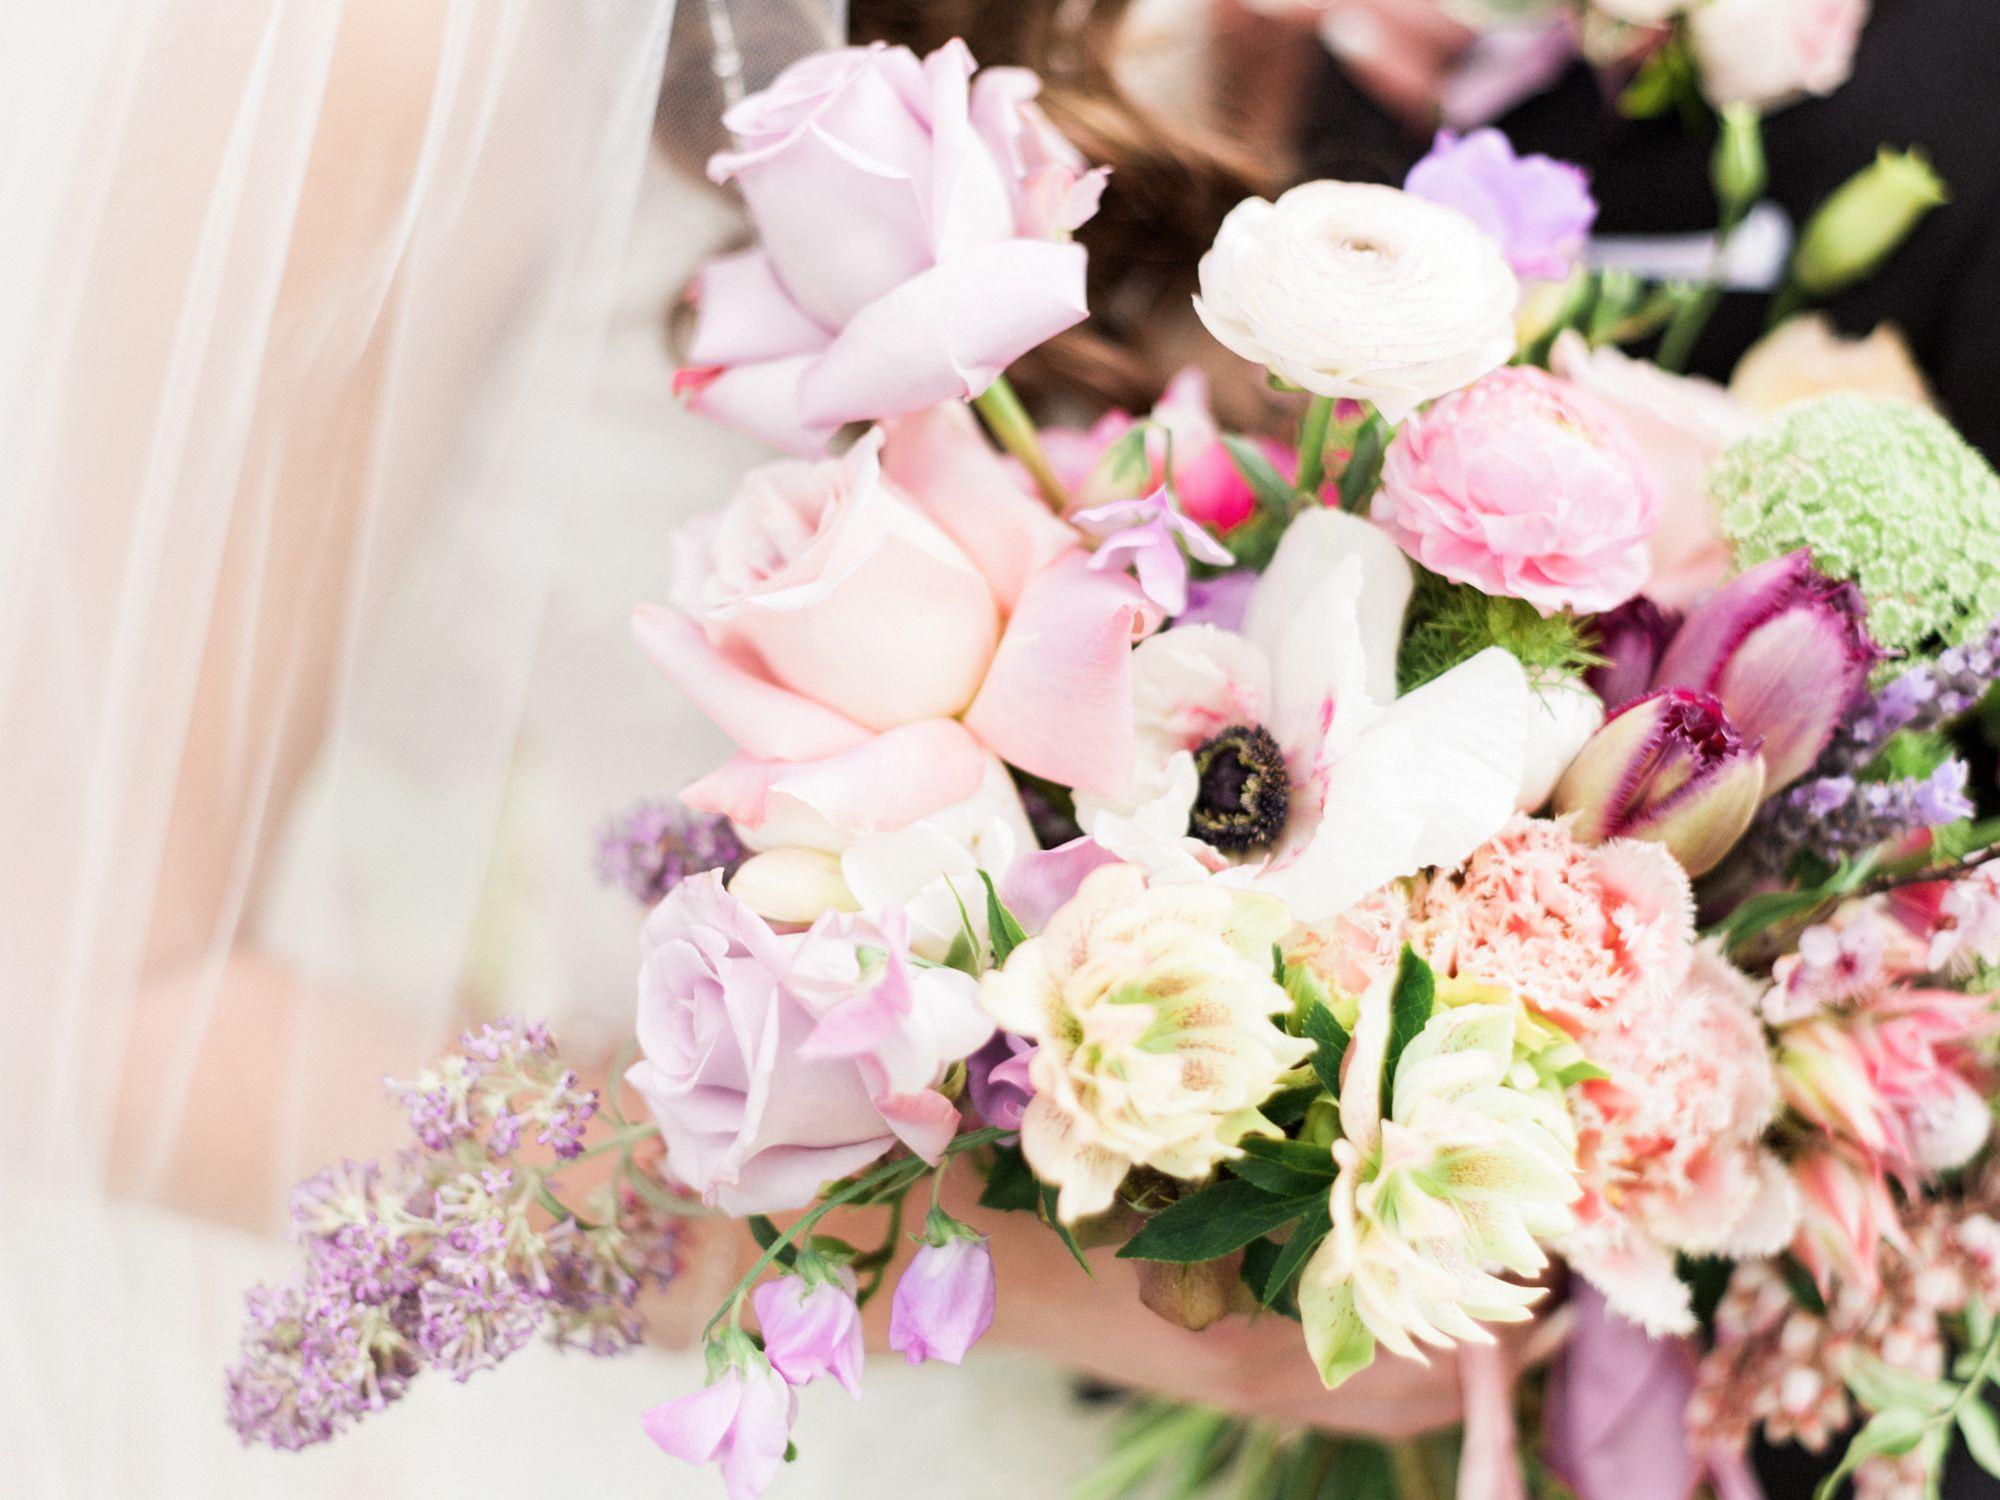 Somphors&dong-wedding-0270.jpg